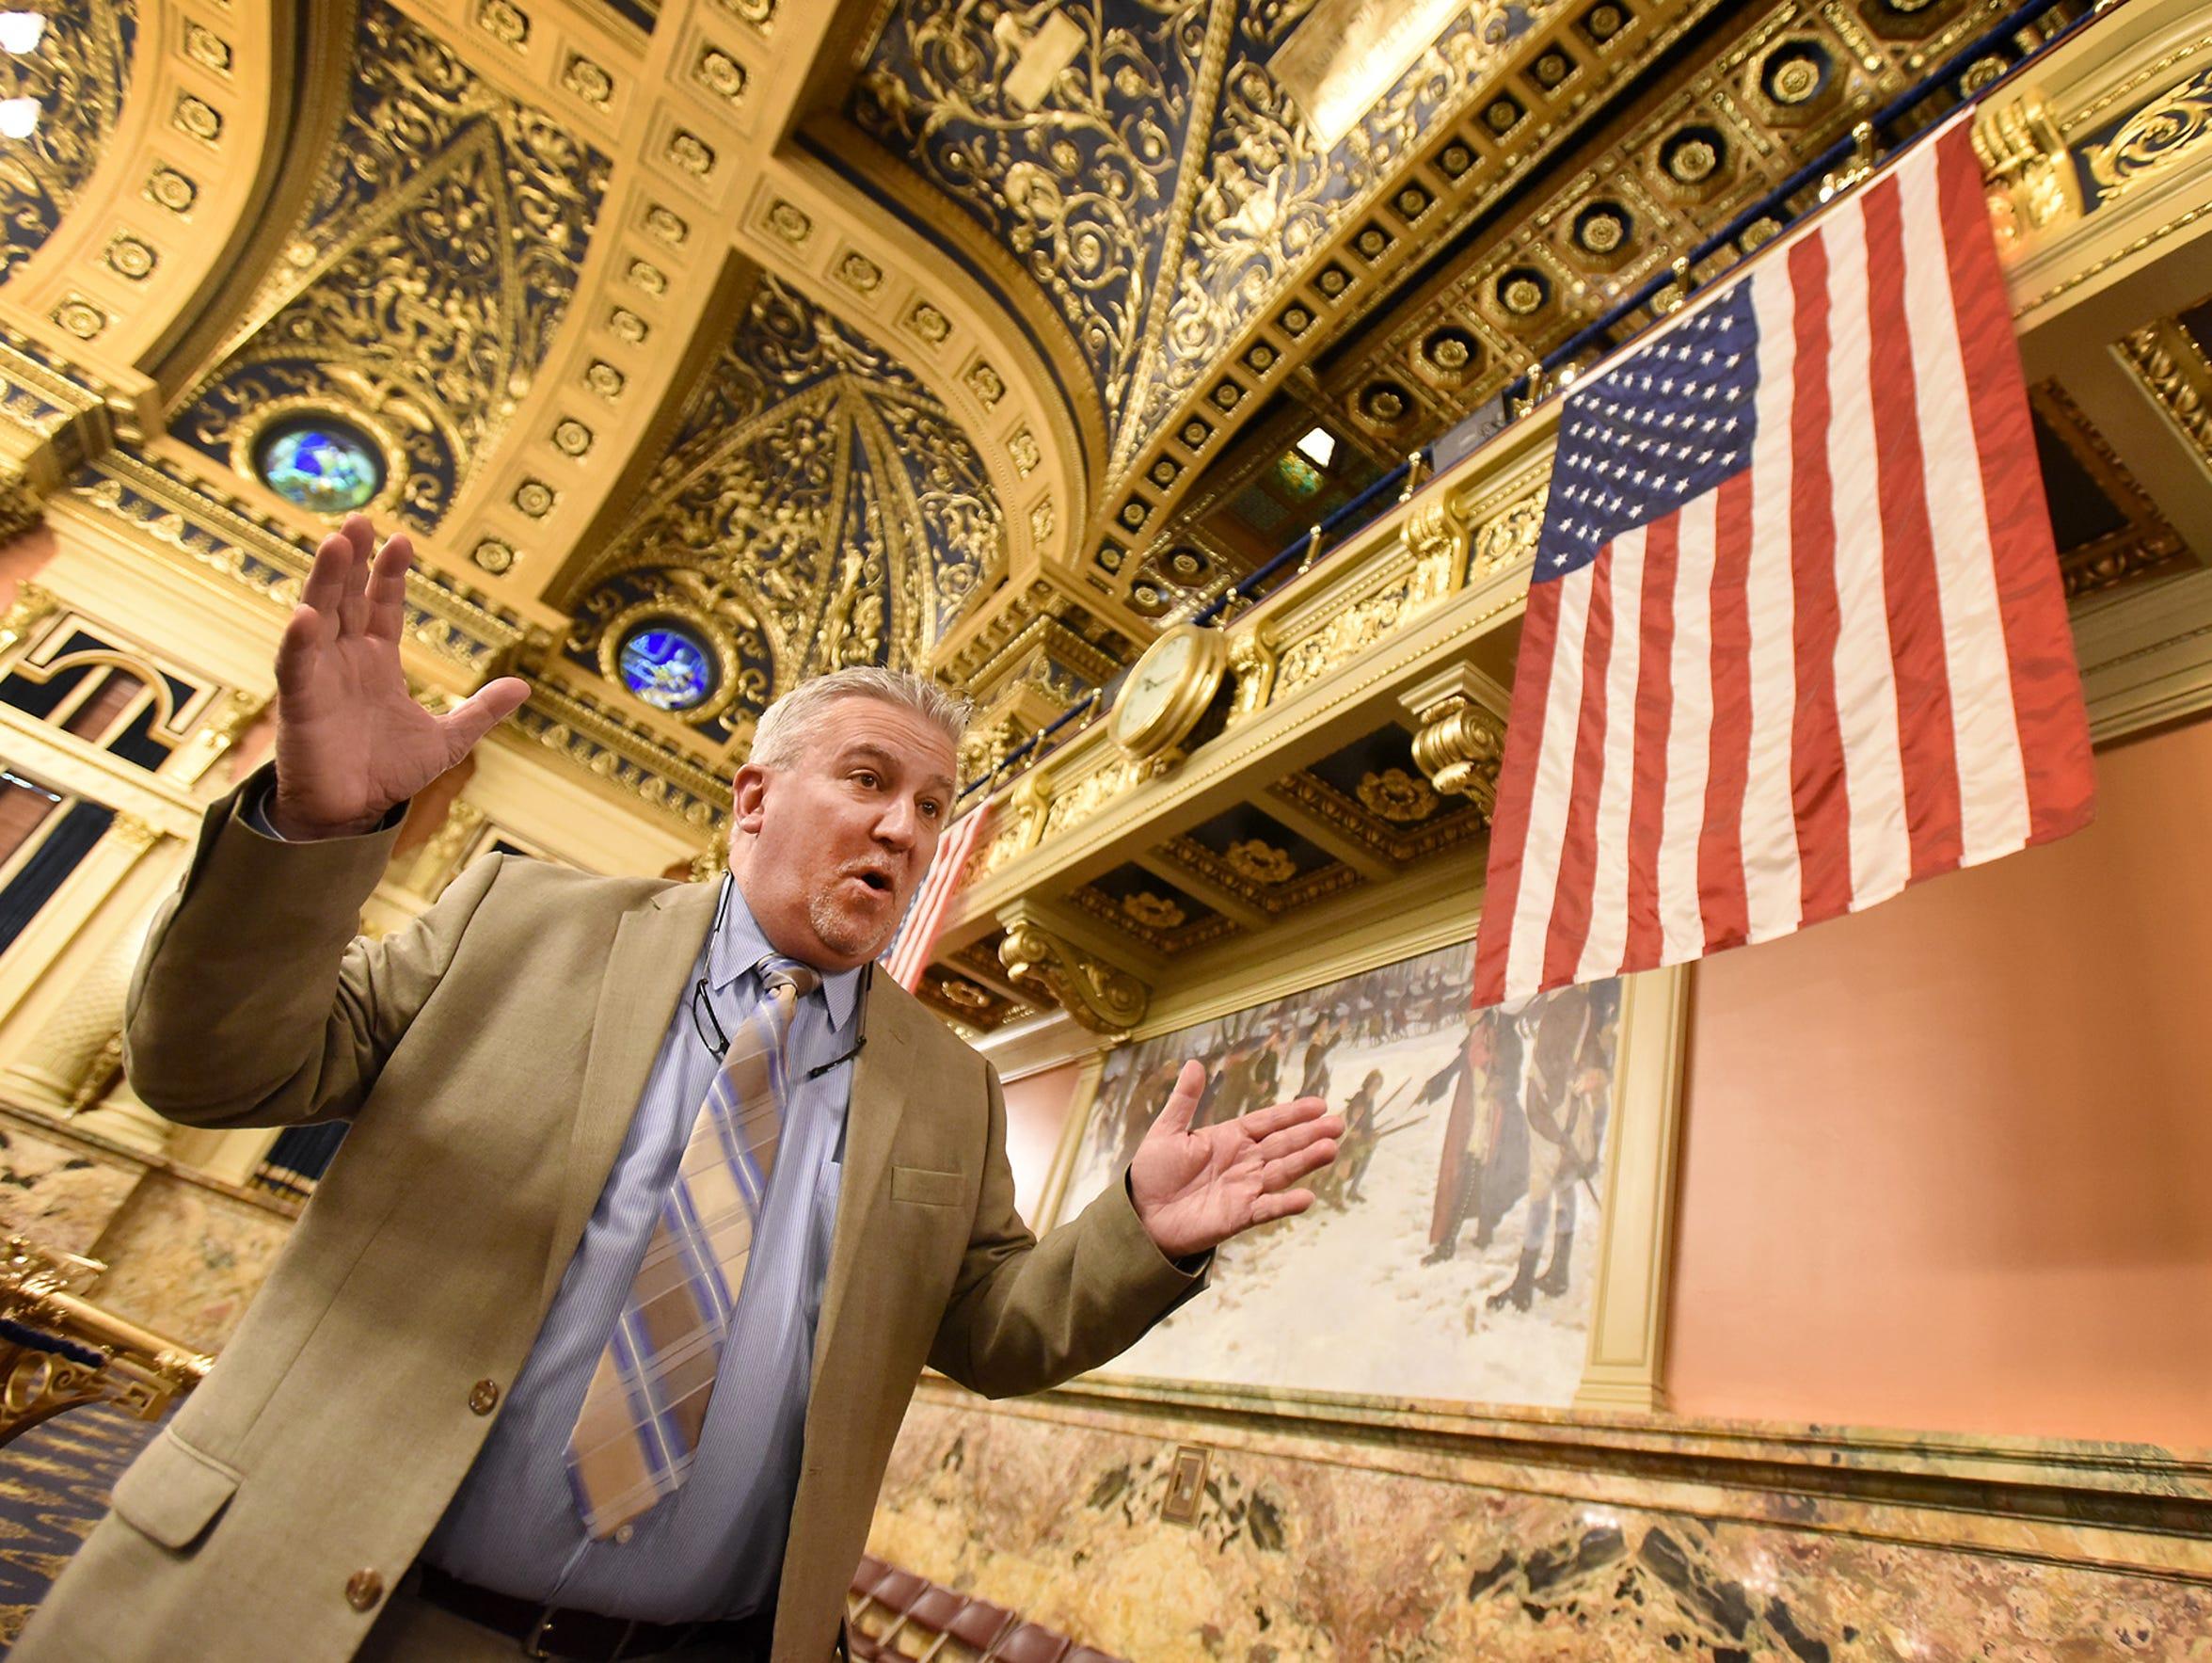 Senator Mike Folmer, PA-48, has been a state senator